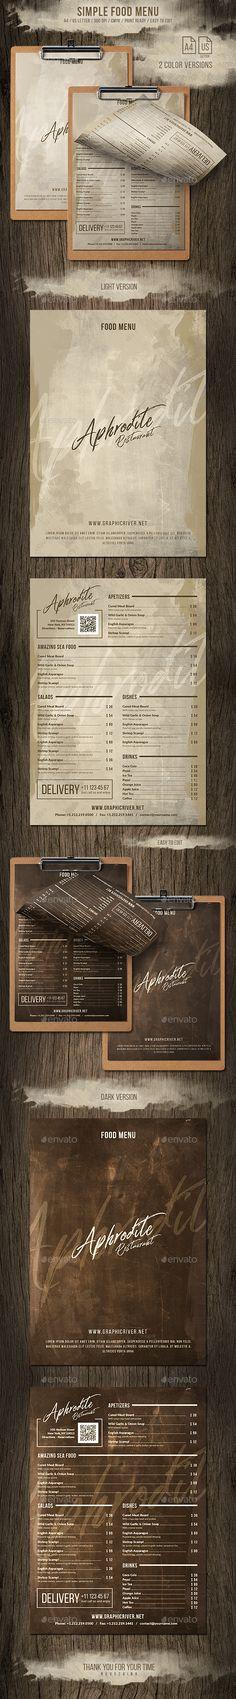 Simple Retro A4 and US Letter Menu (2 Color) - Food Menus Print Templates